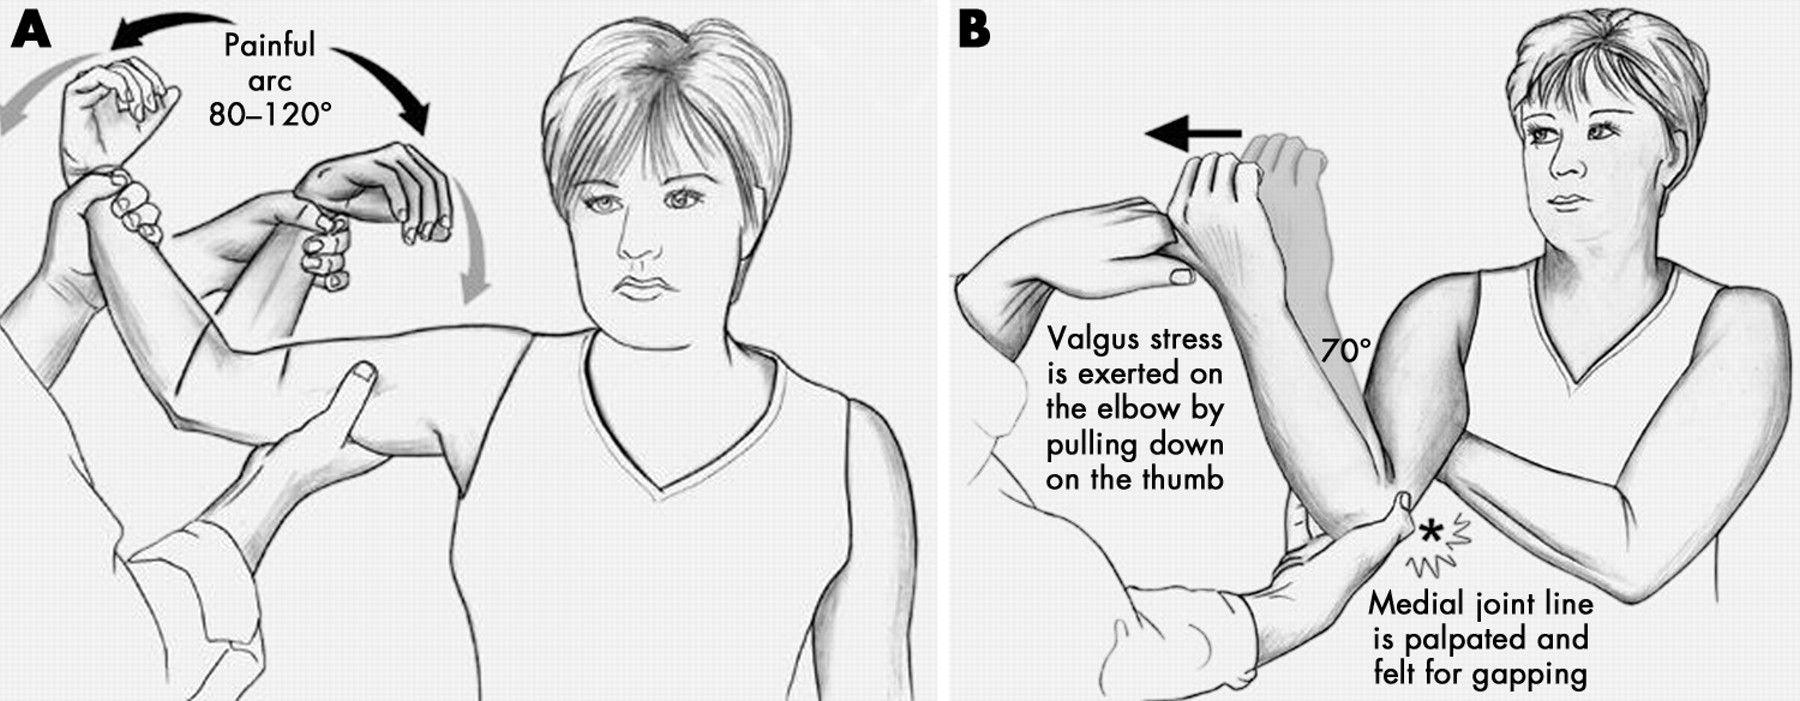 Valgus stress test